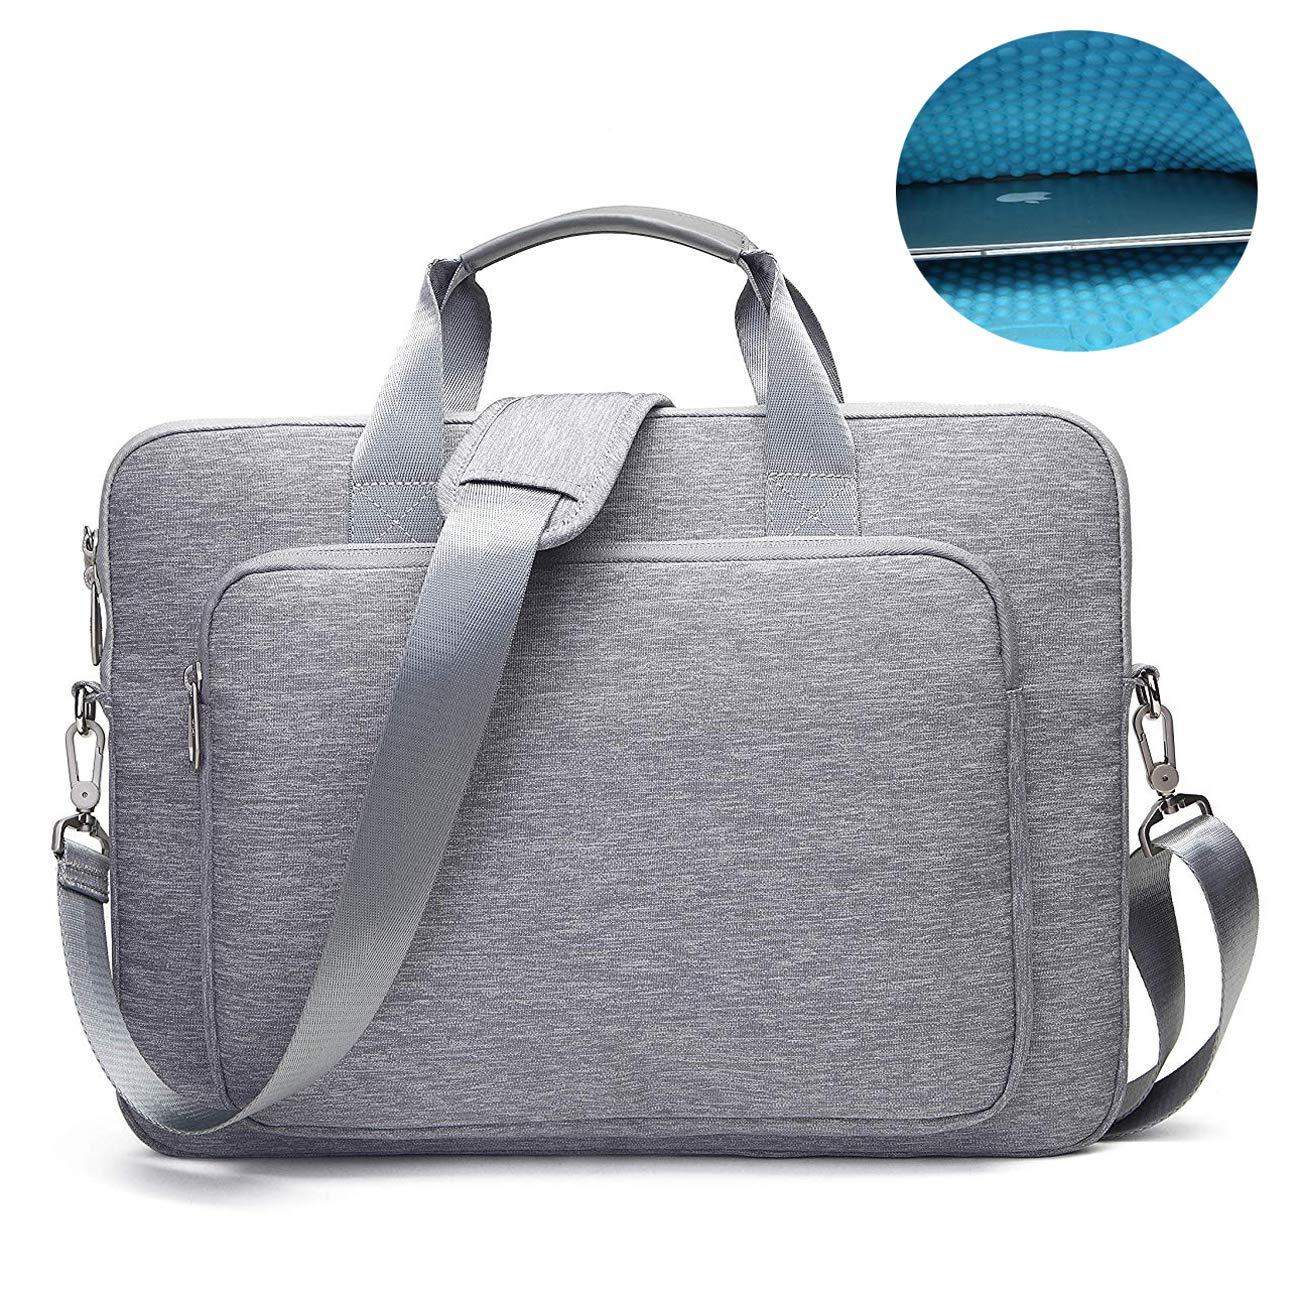 15.6 Inch Laptop Briefcase Messenger Shoulder Bag Handle Shoulder Strap Multi-Functional Waterproof Carrying Case Laptop/Notebook/MacBook/Ultrabook/Chromebook Computers